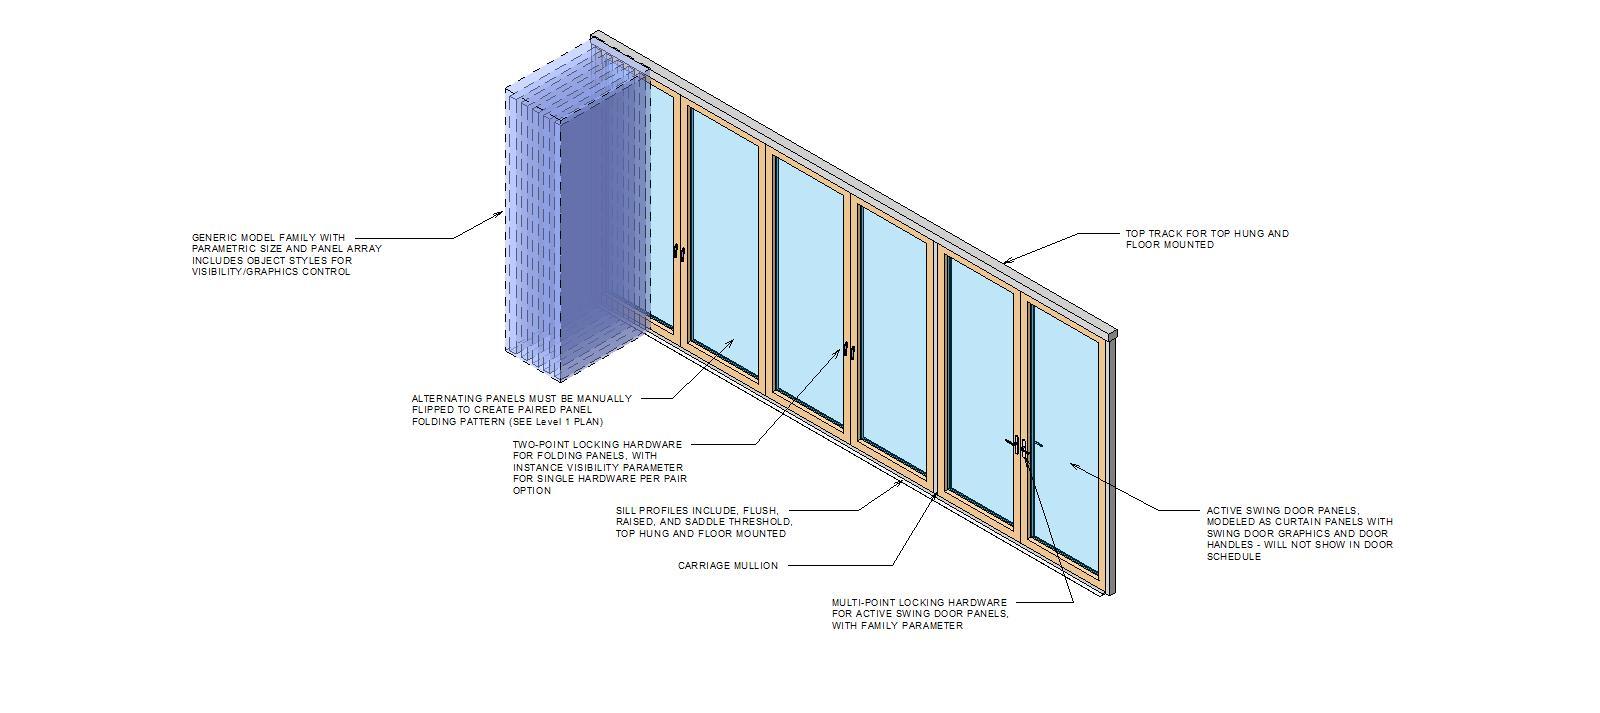 Nana wall systems inc entrances storefronts and for Nanawall plan